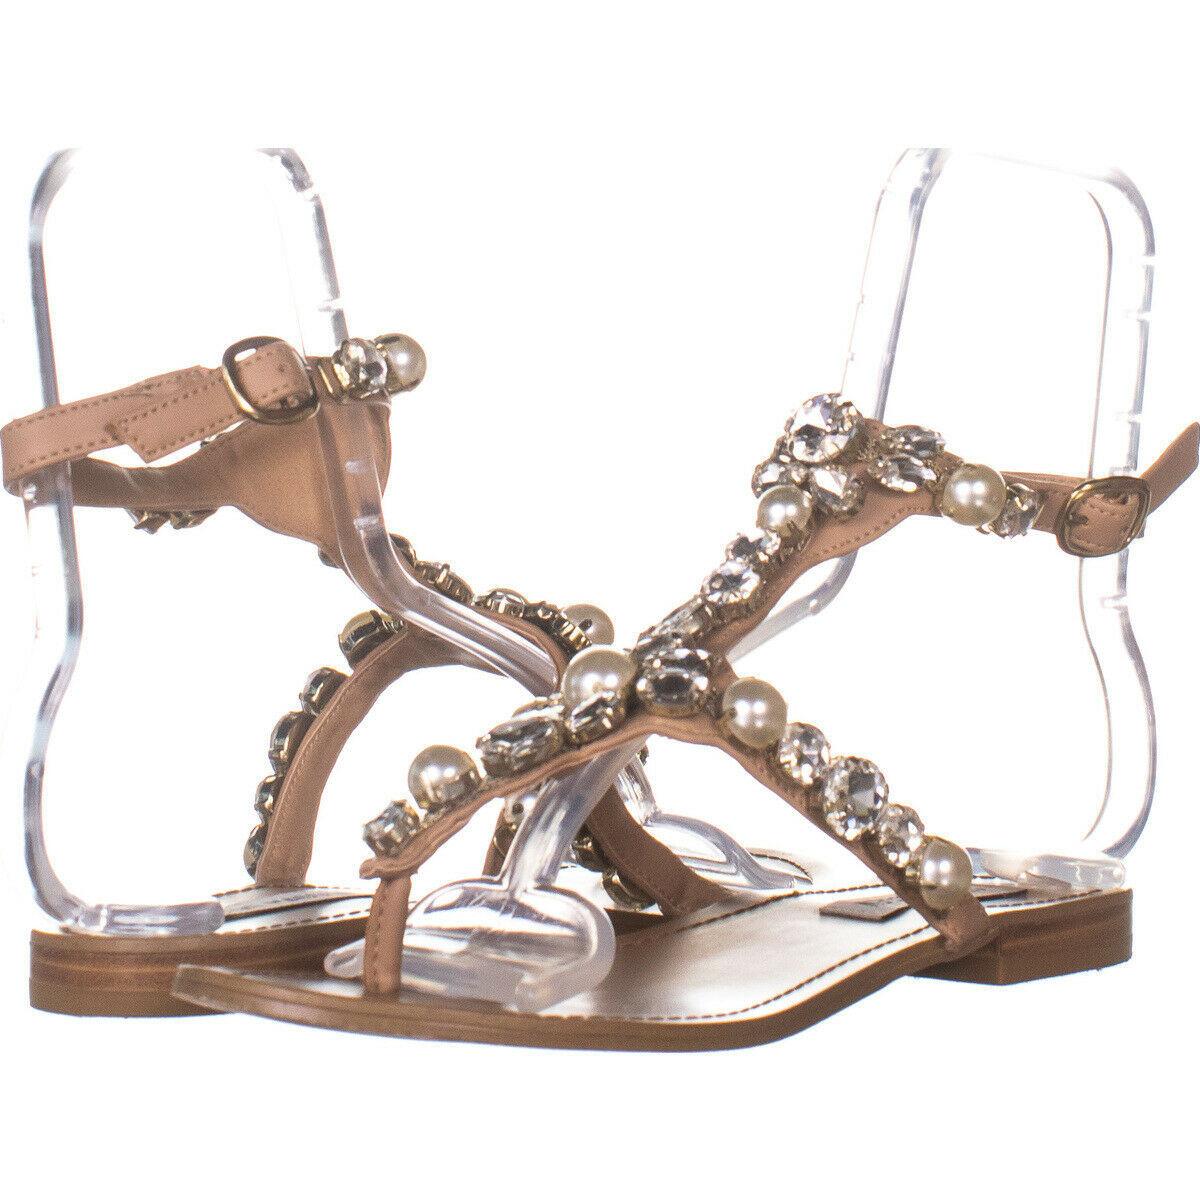 Steve Madden Chantel Flat Ankle Strap Sandals, Blush Multi 115, Blush Multi, 7